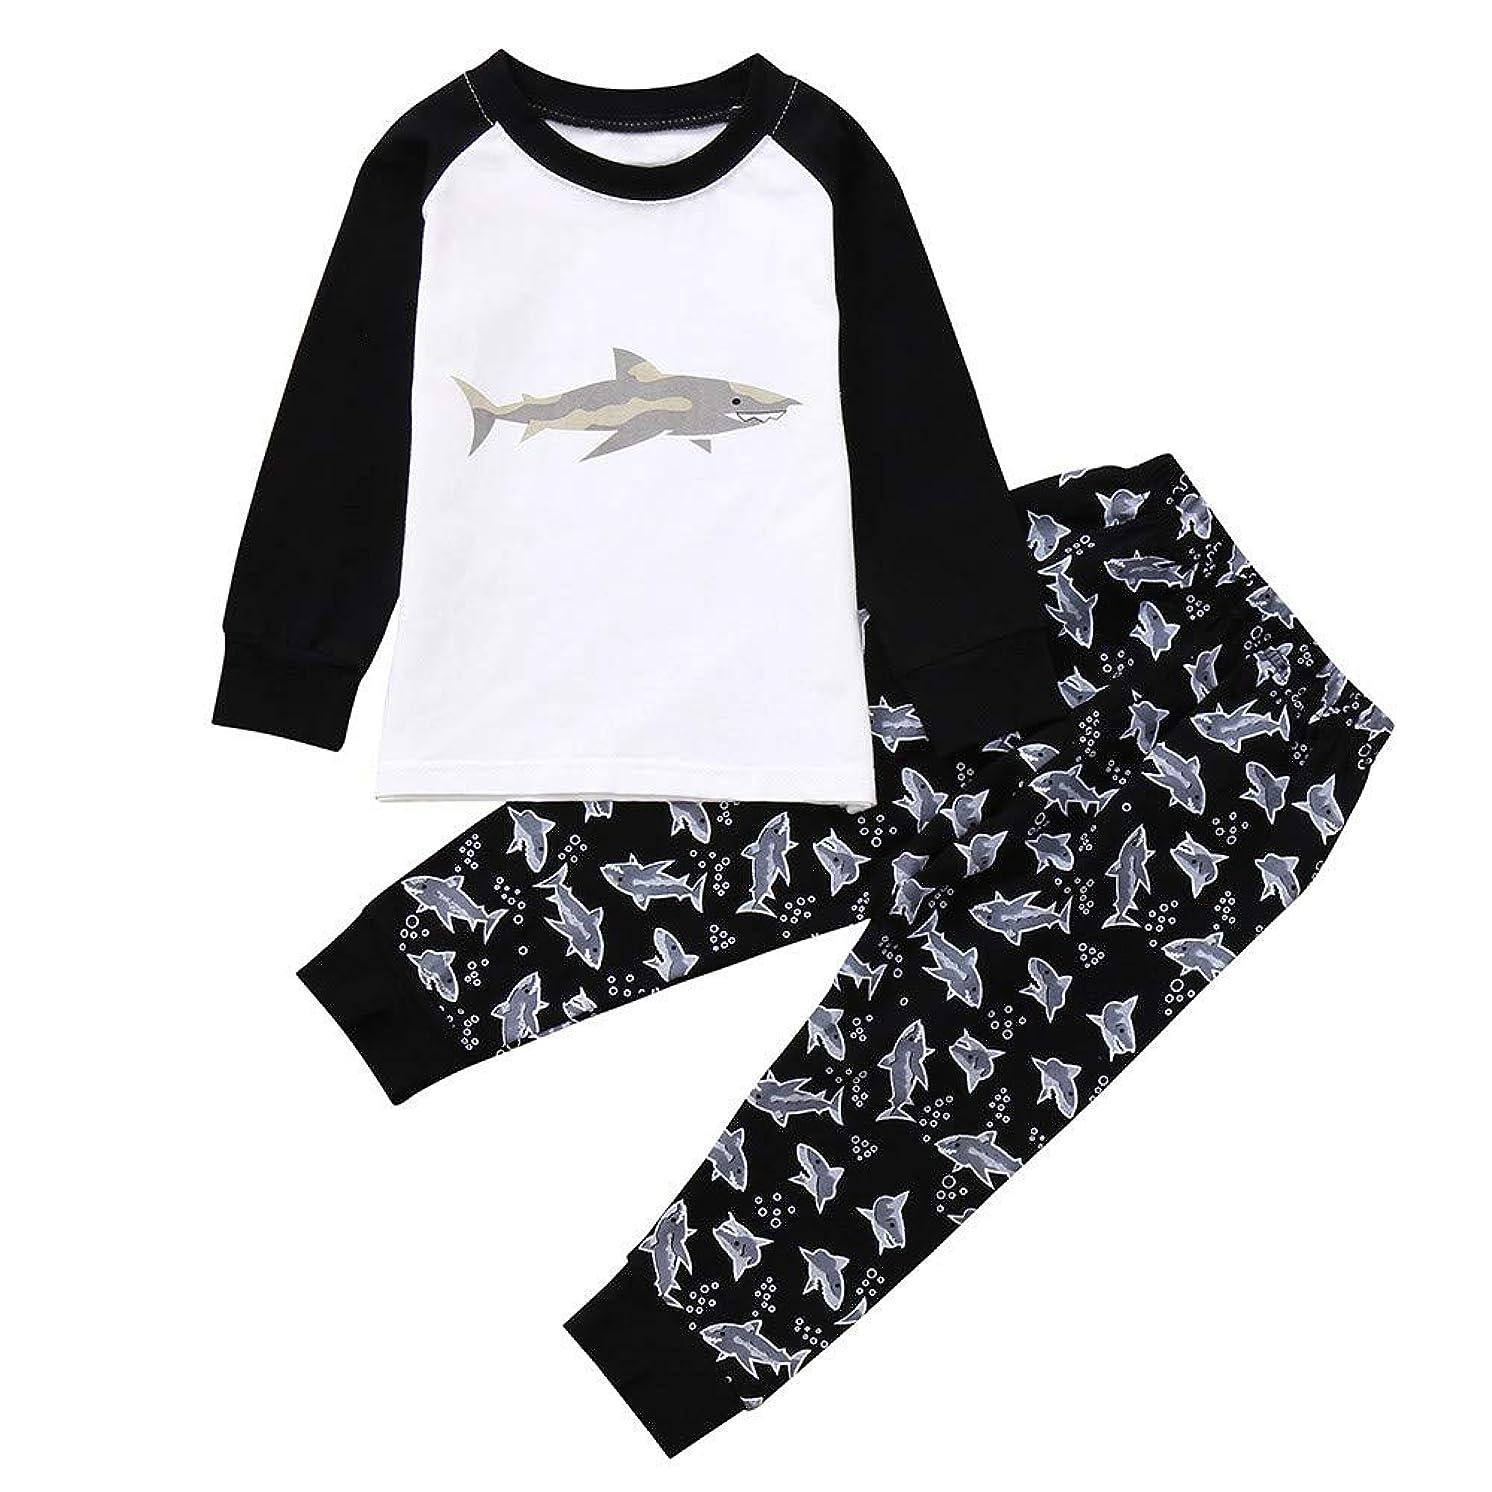 Boys Cartoon Shark Tops Shirts Pants for 0-7 Years Old Kid Outfits Pajamas